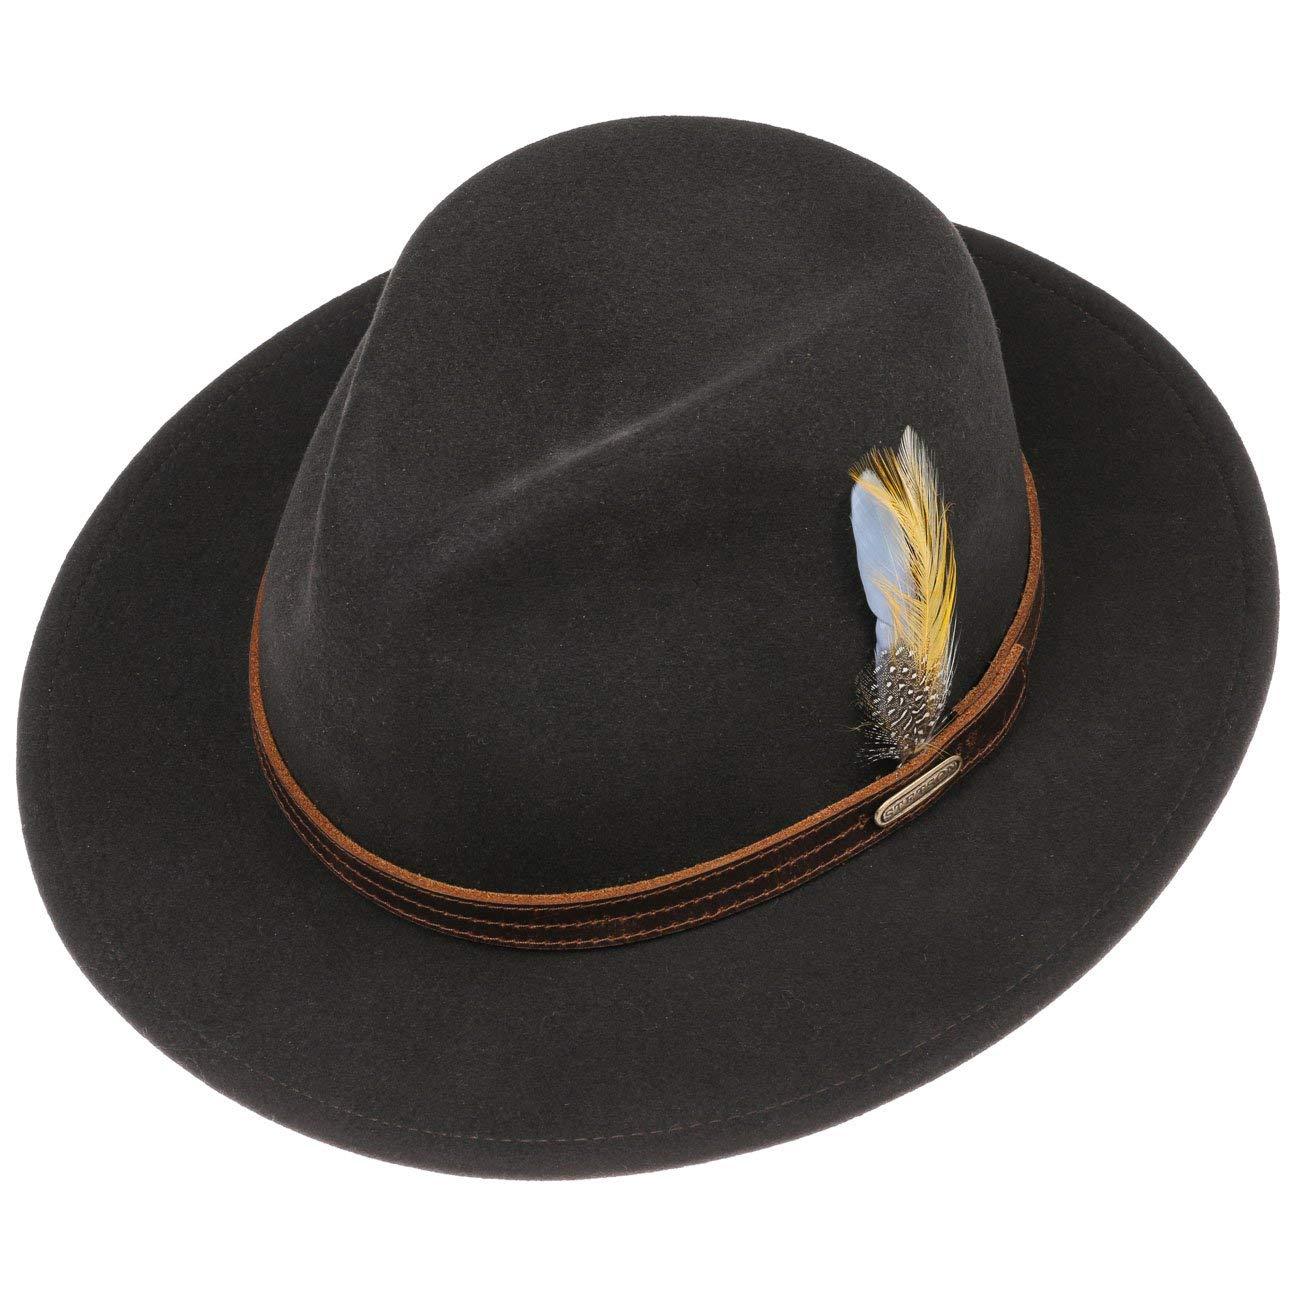 Made in USA Stetson Stampton Traveller VitaFelt Hat Men